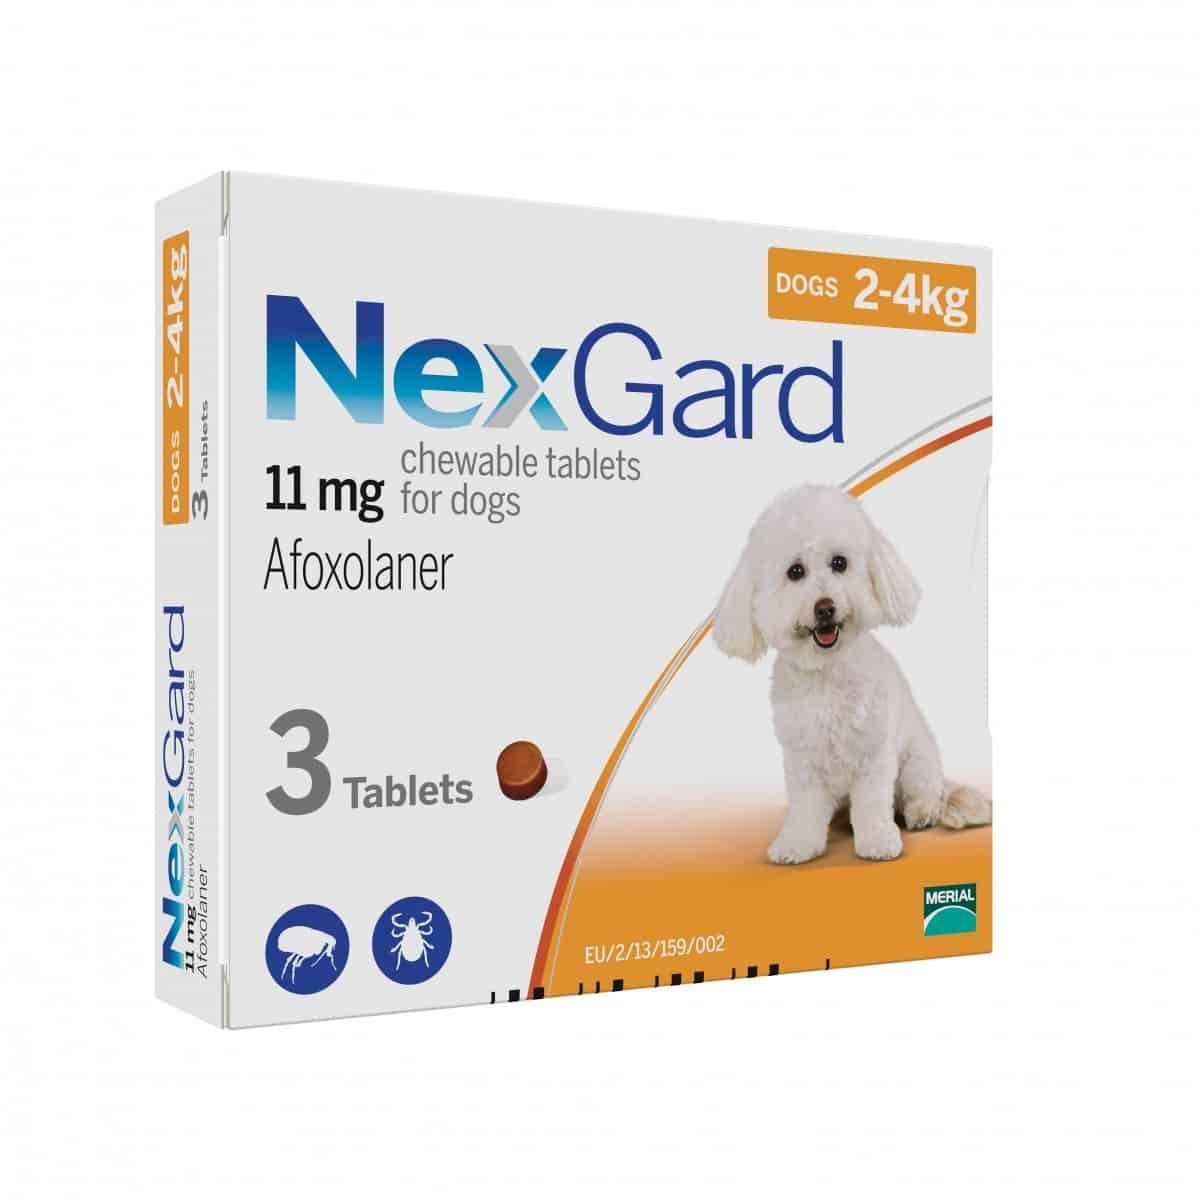 Nexgard - 2kg to 4kg